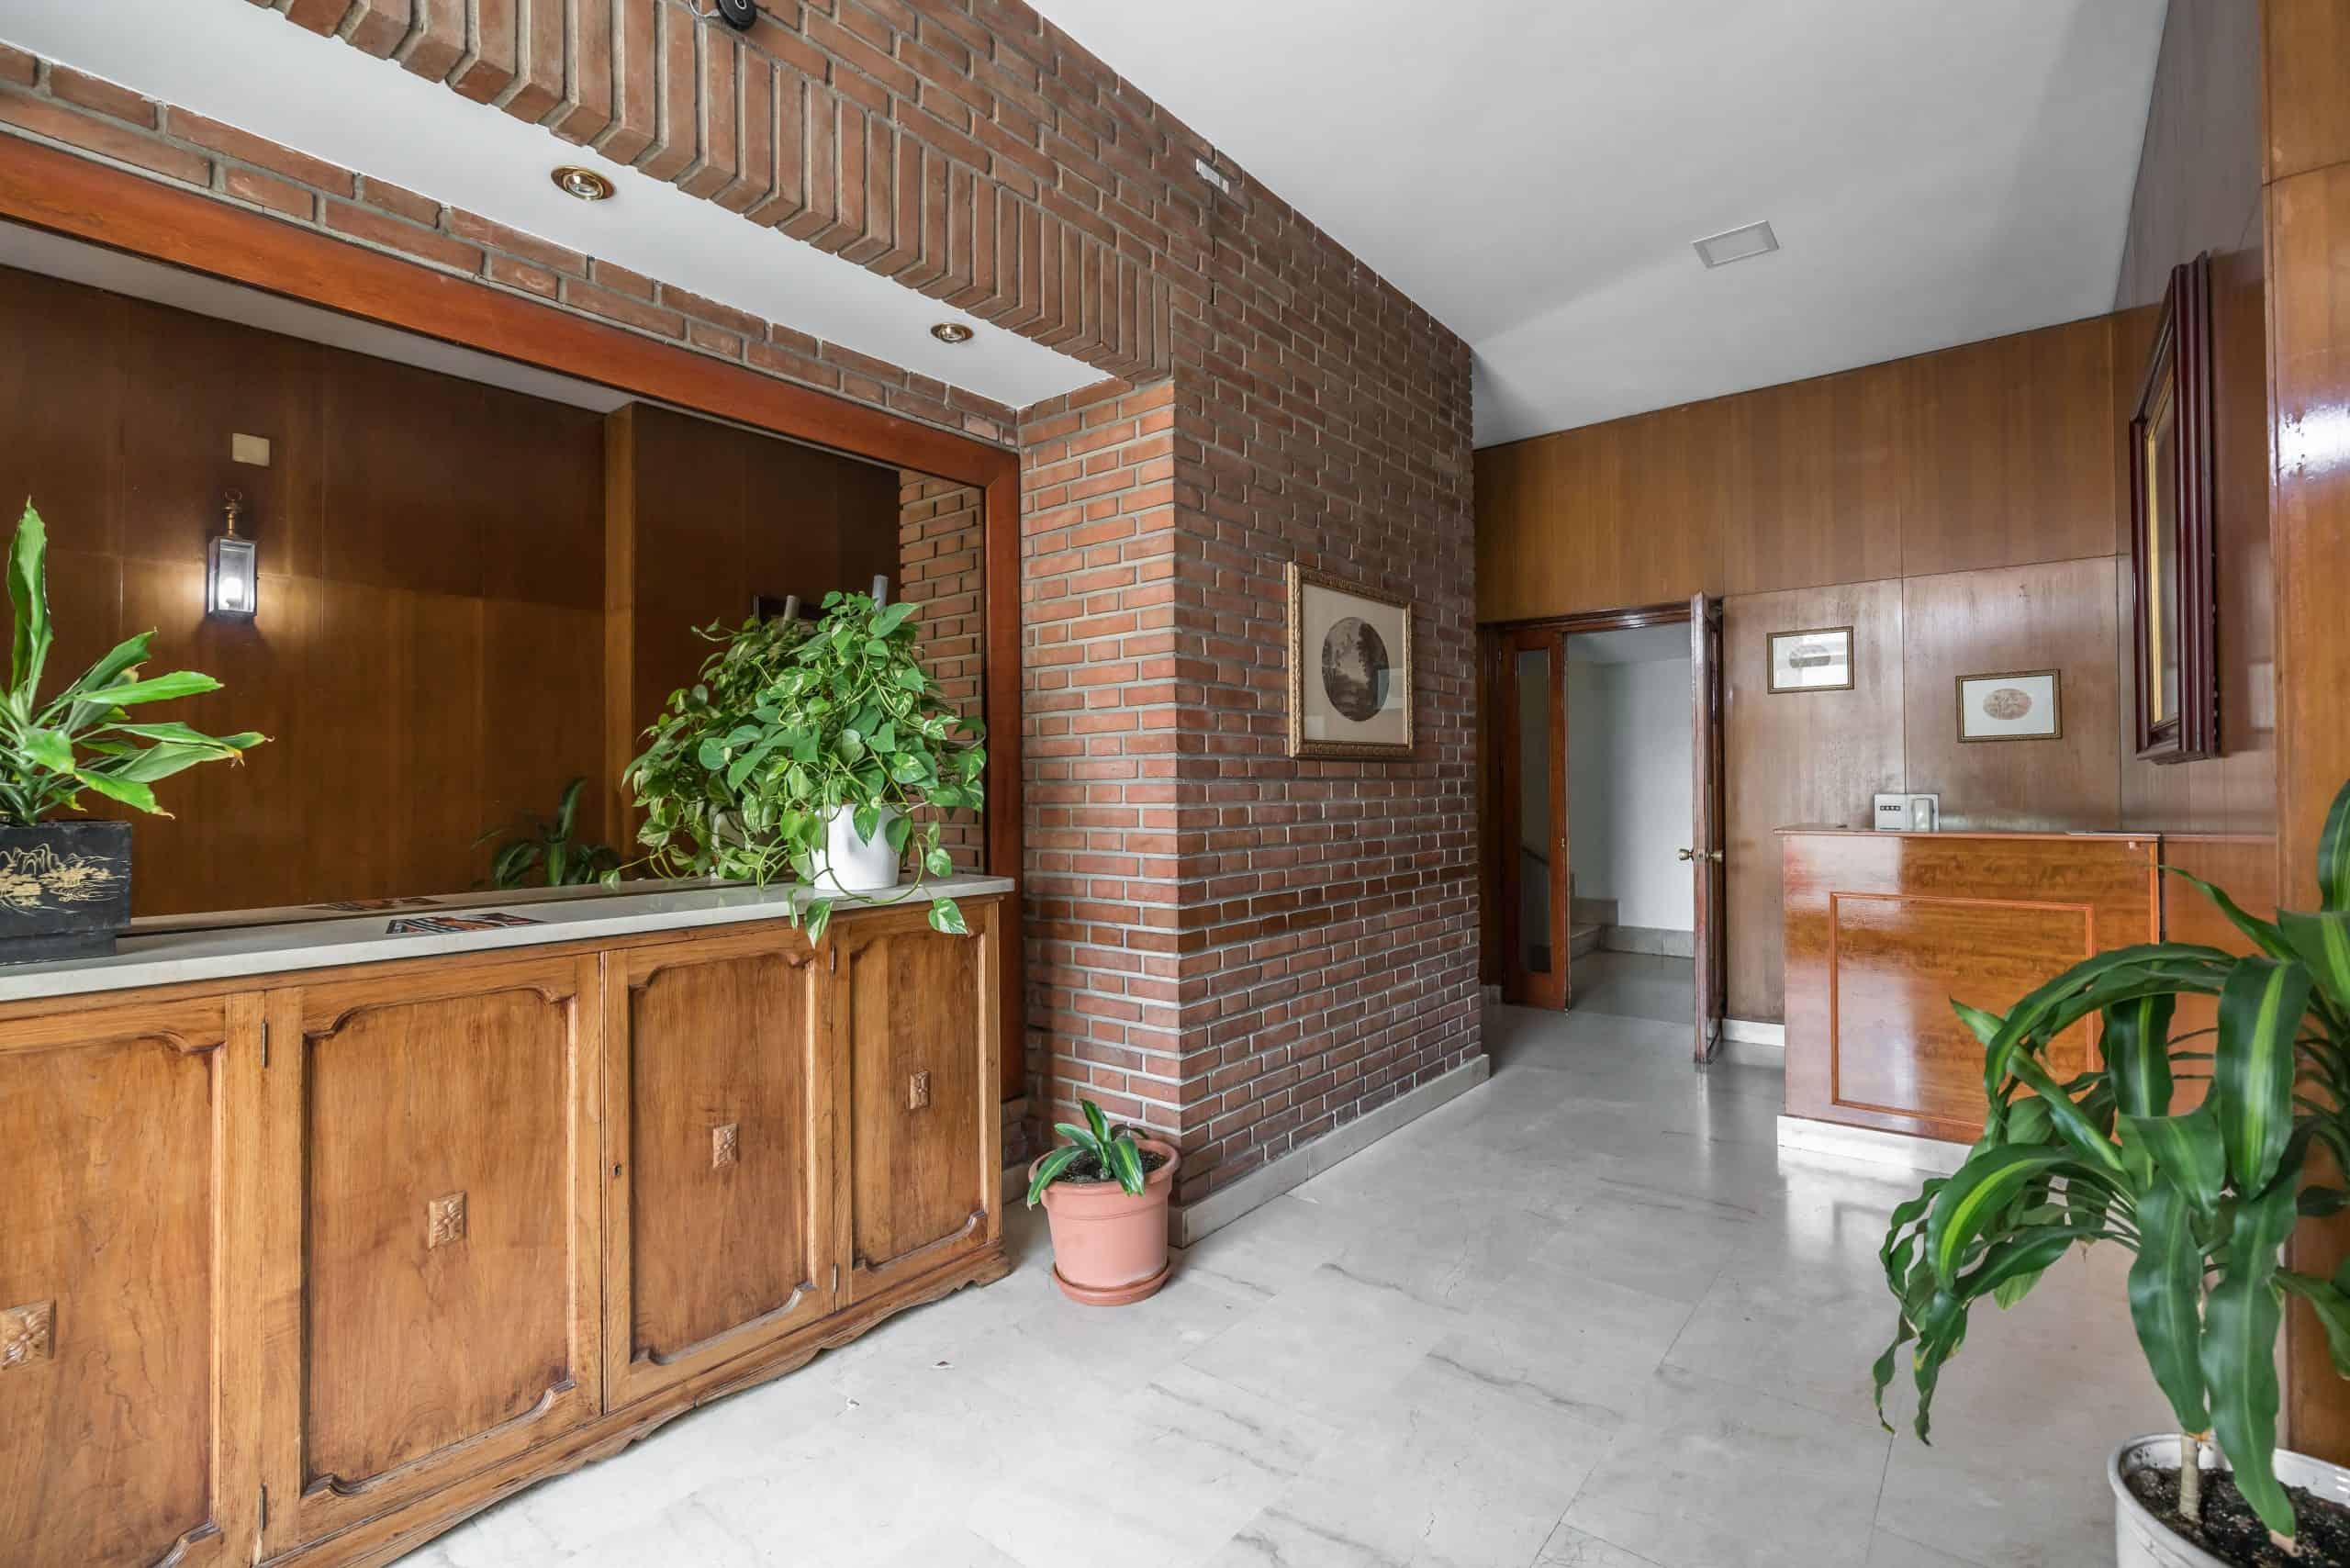 Agencia Inmobiliaria de Madrid-FUTUROCASA-Zona ARGANZUELA-LEGAZPI -calle Modesto Lafuente 41,1ºC Zonas comunes 2